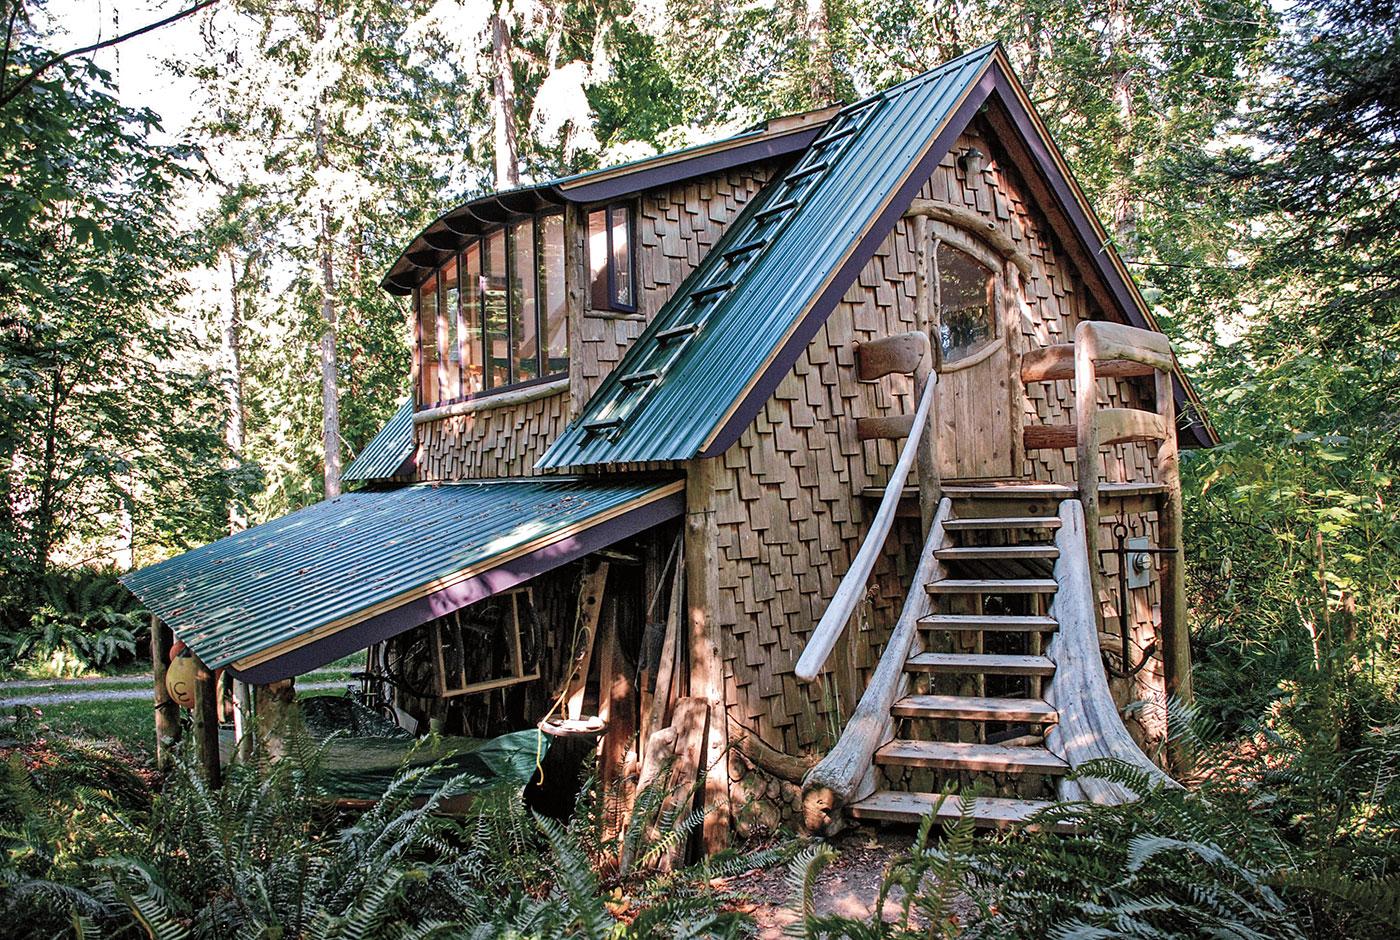 Grahams WorkshopStudio on an Island in BC  The Shelter Blog